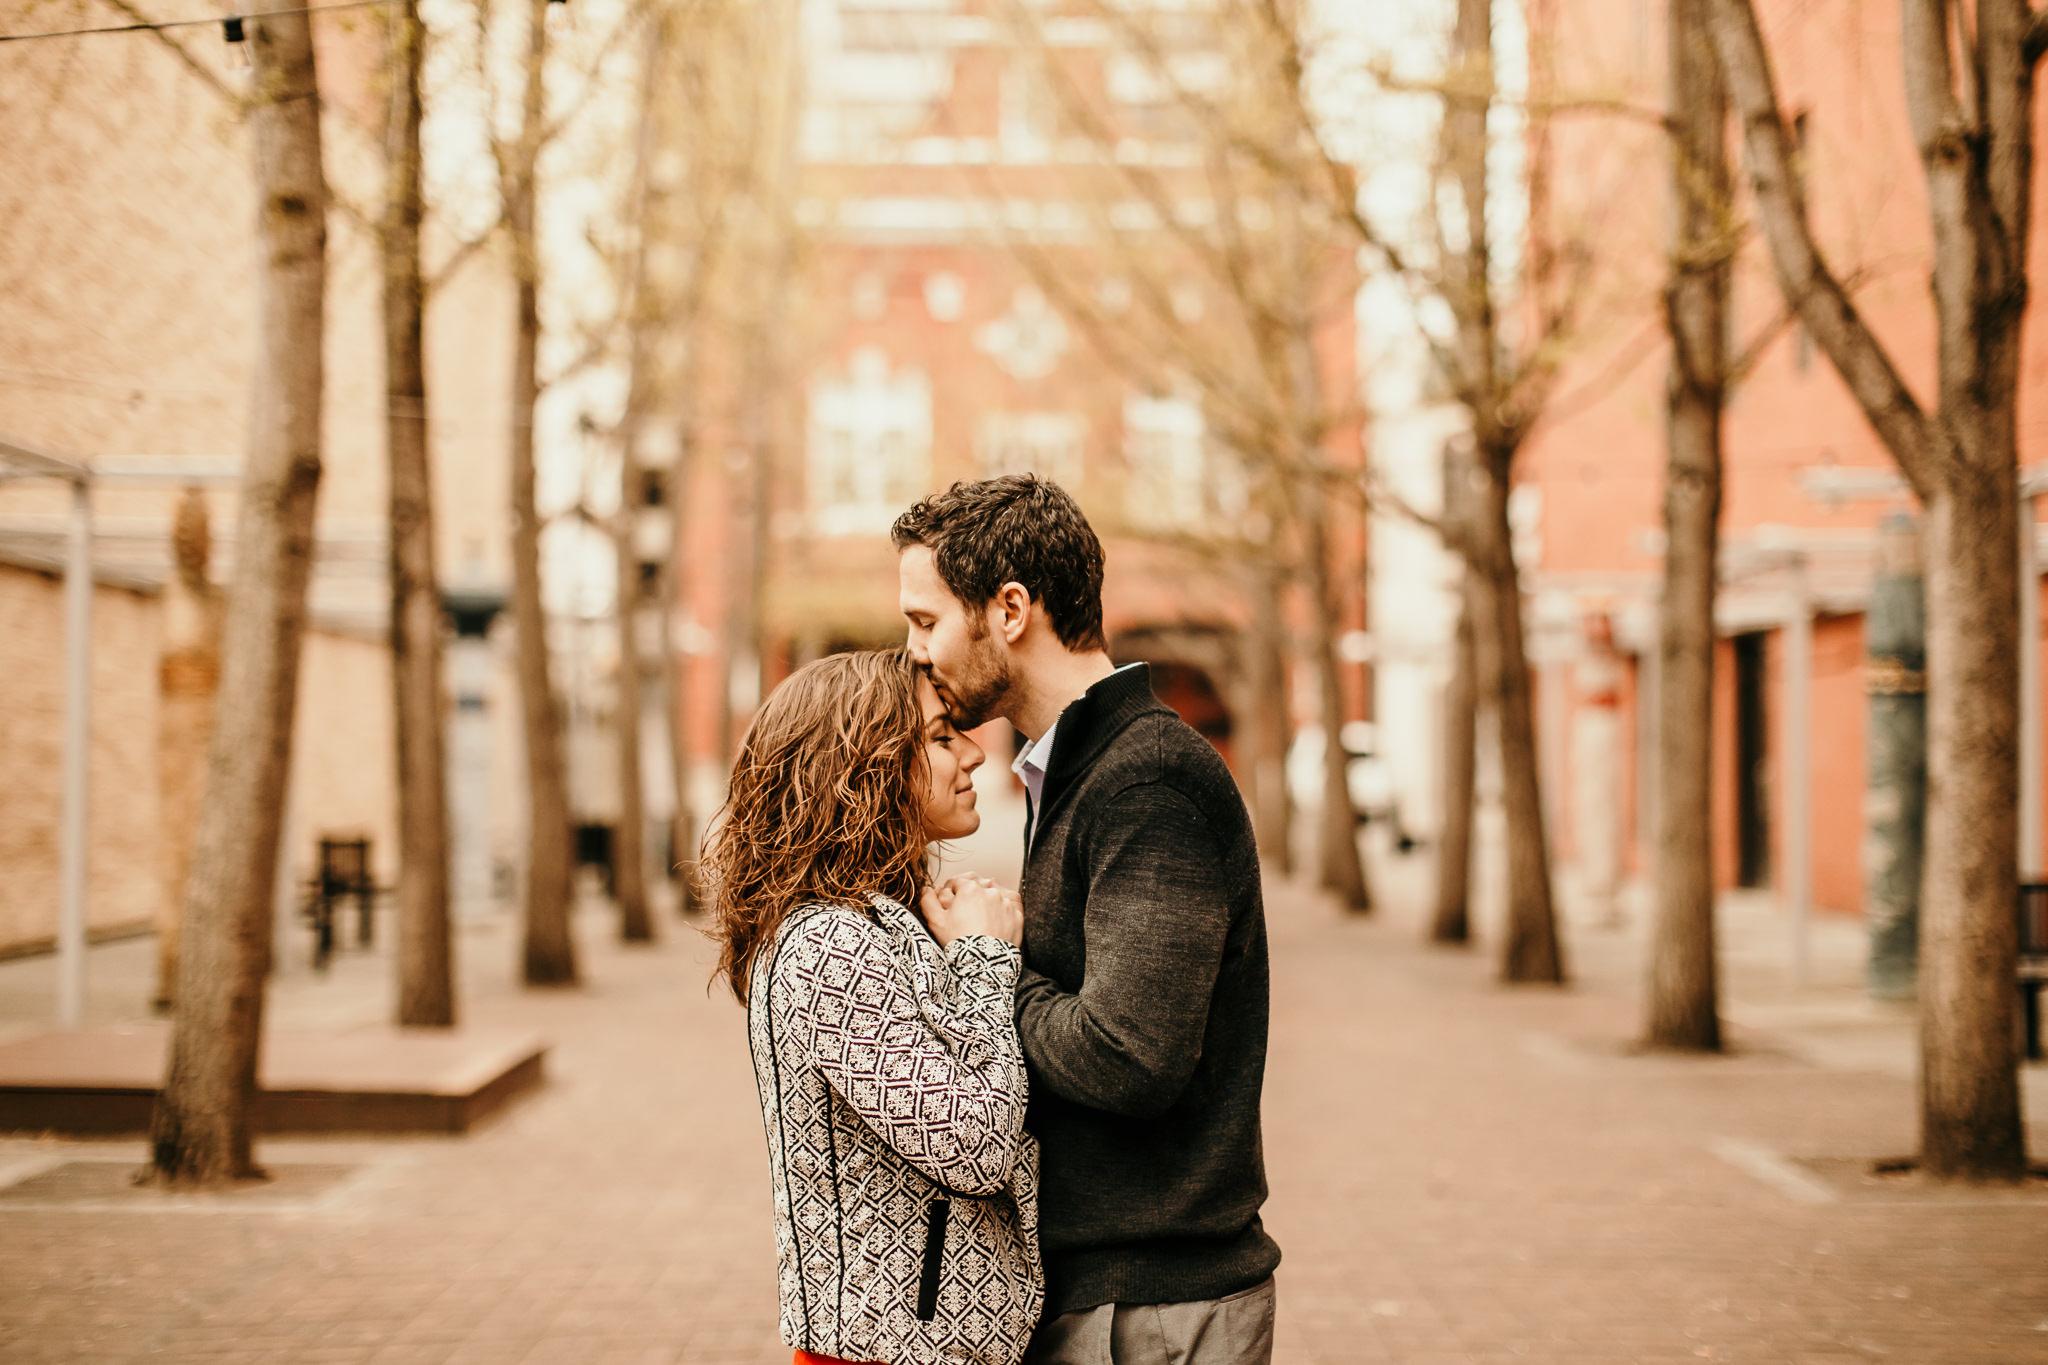 Engagement - Downtown Roanoke - Virginia - Wedding Photographer - Pat Cori Photography-31.jpg